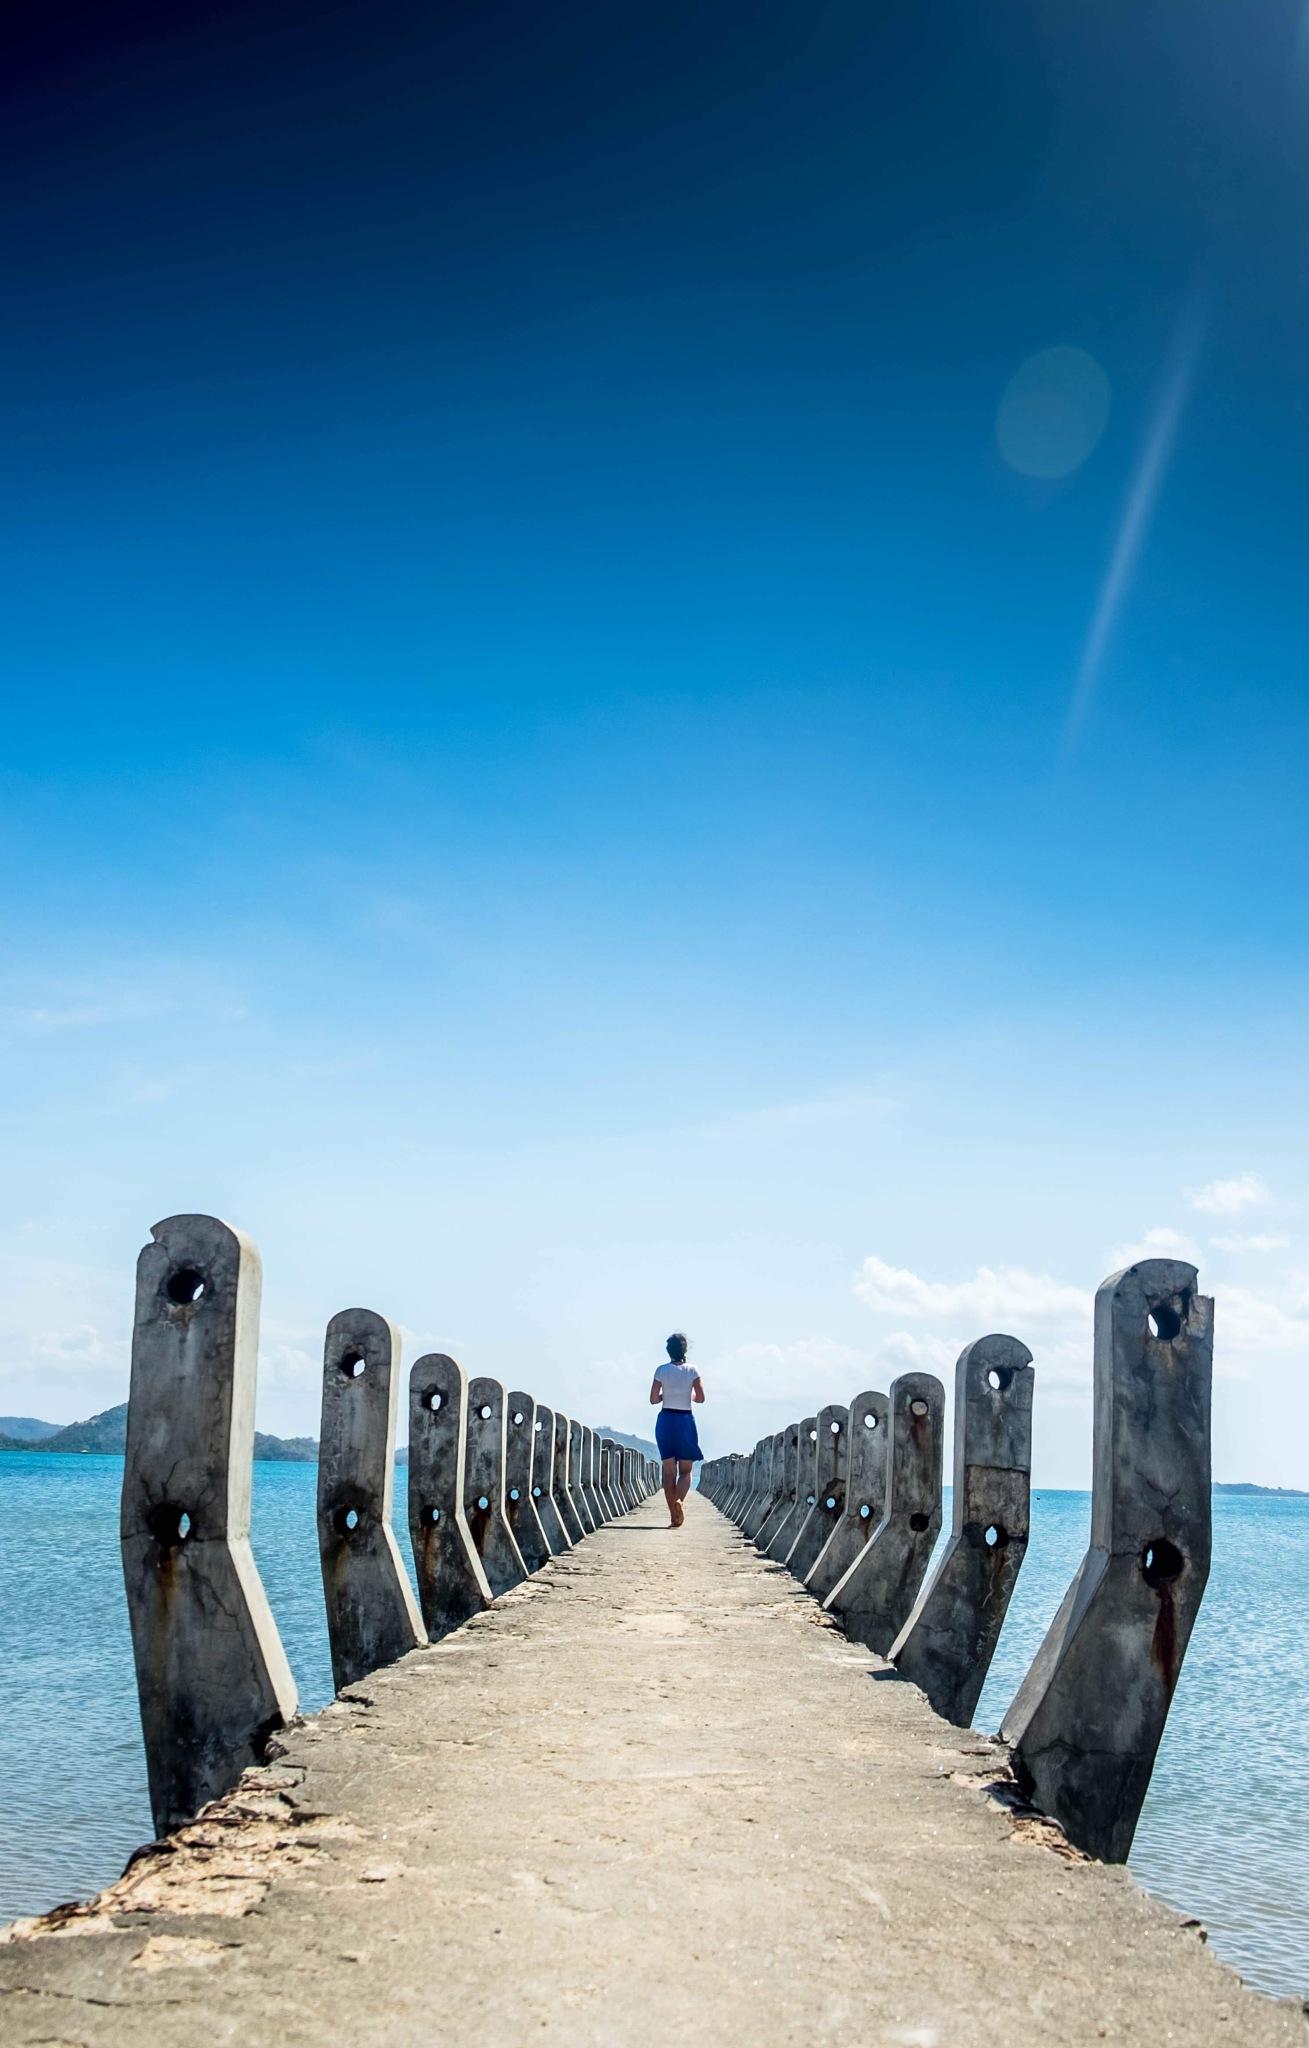 Lombok Pier by Sergei Smirnov